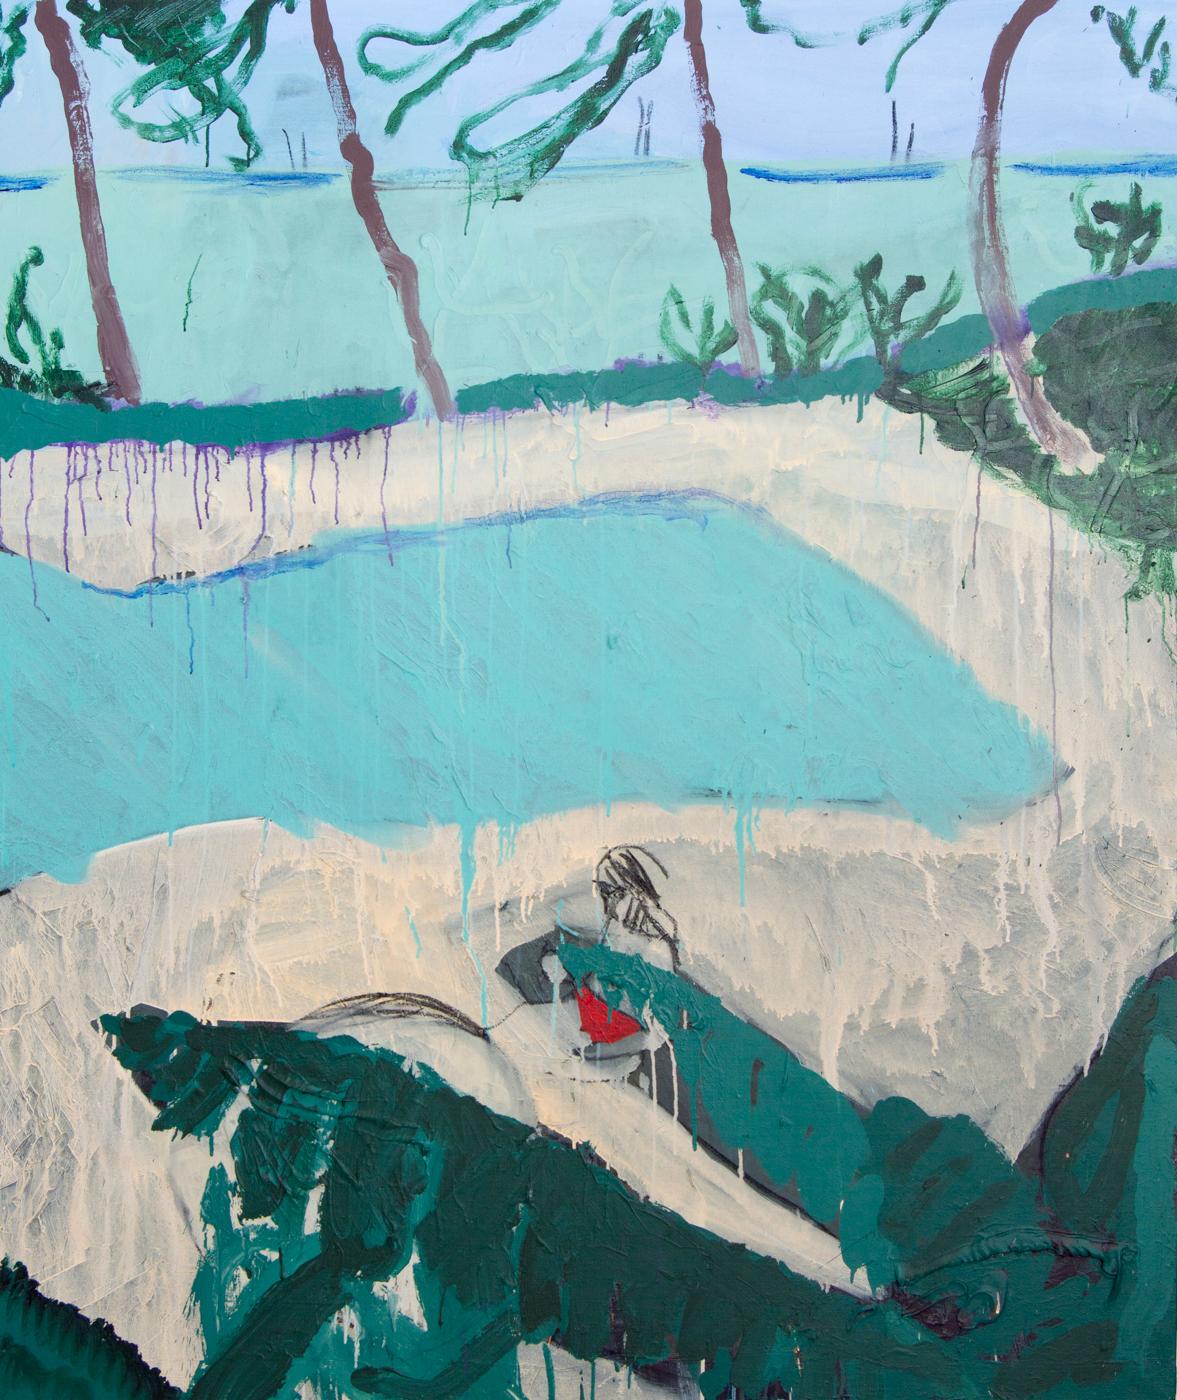 Svømmebasseng_Akrylogkullpålinlerret_160x135cm_2016.jpg